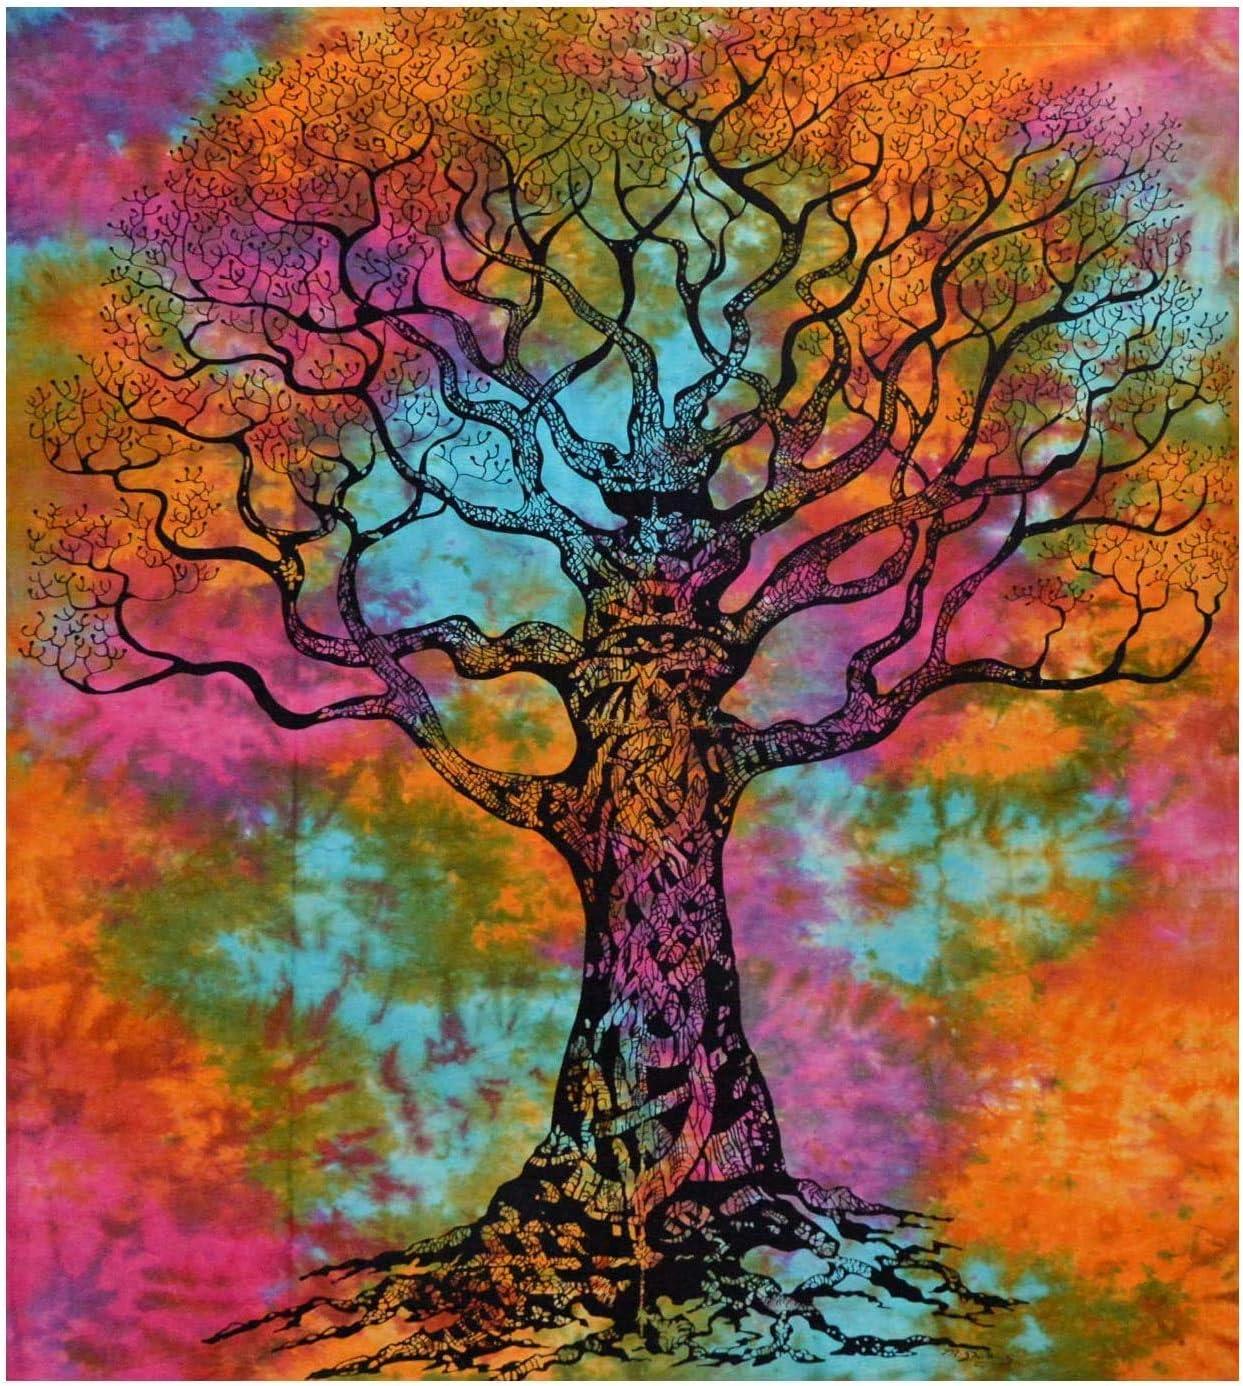 Mandala Tapestry Bohemian Wall Hanging, Psychedelic Wall Art, Dorm D cor Beach Throw, Indian Wall Tapestries Art